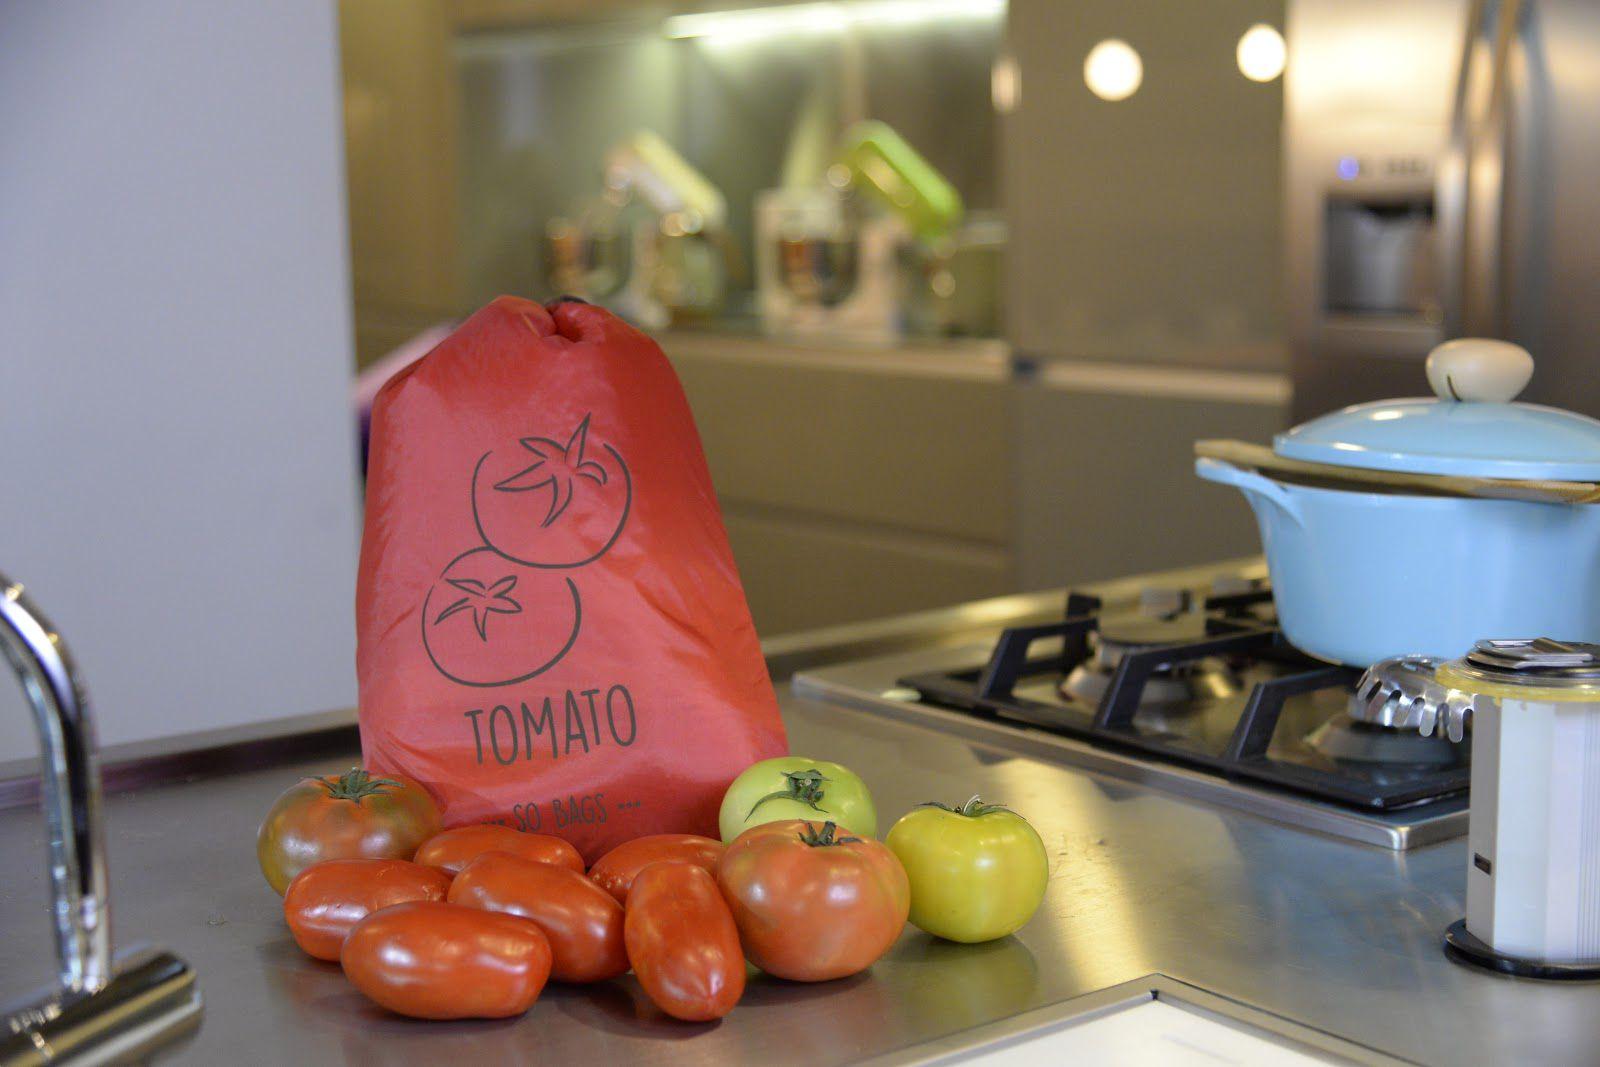 Saquinhos Conservadores de Alimento - Tomato (tomate) - So Bags